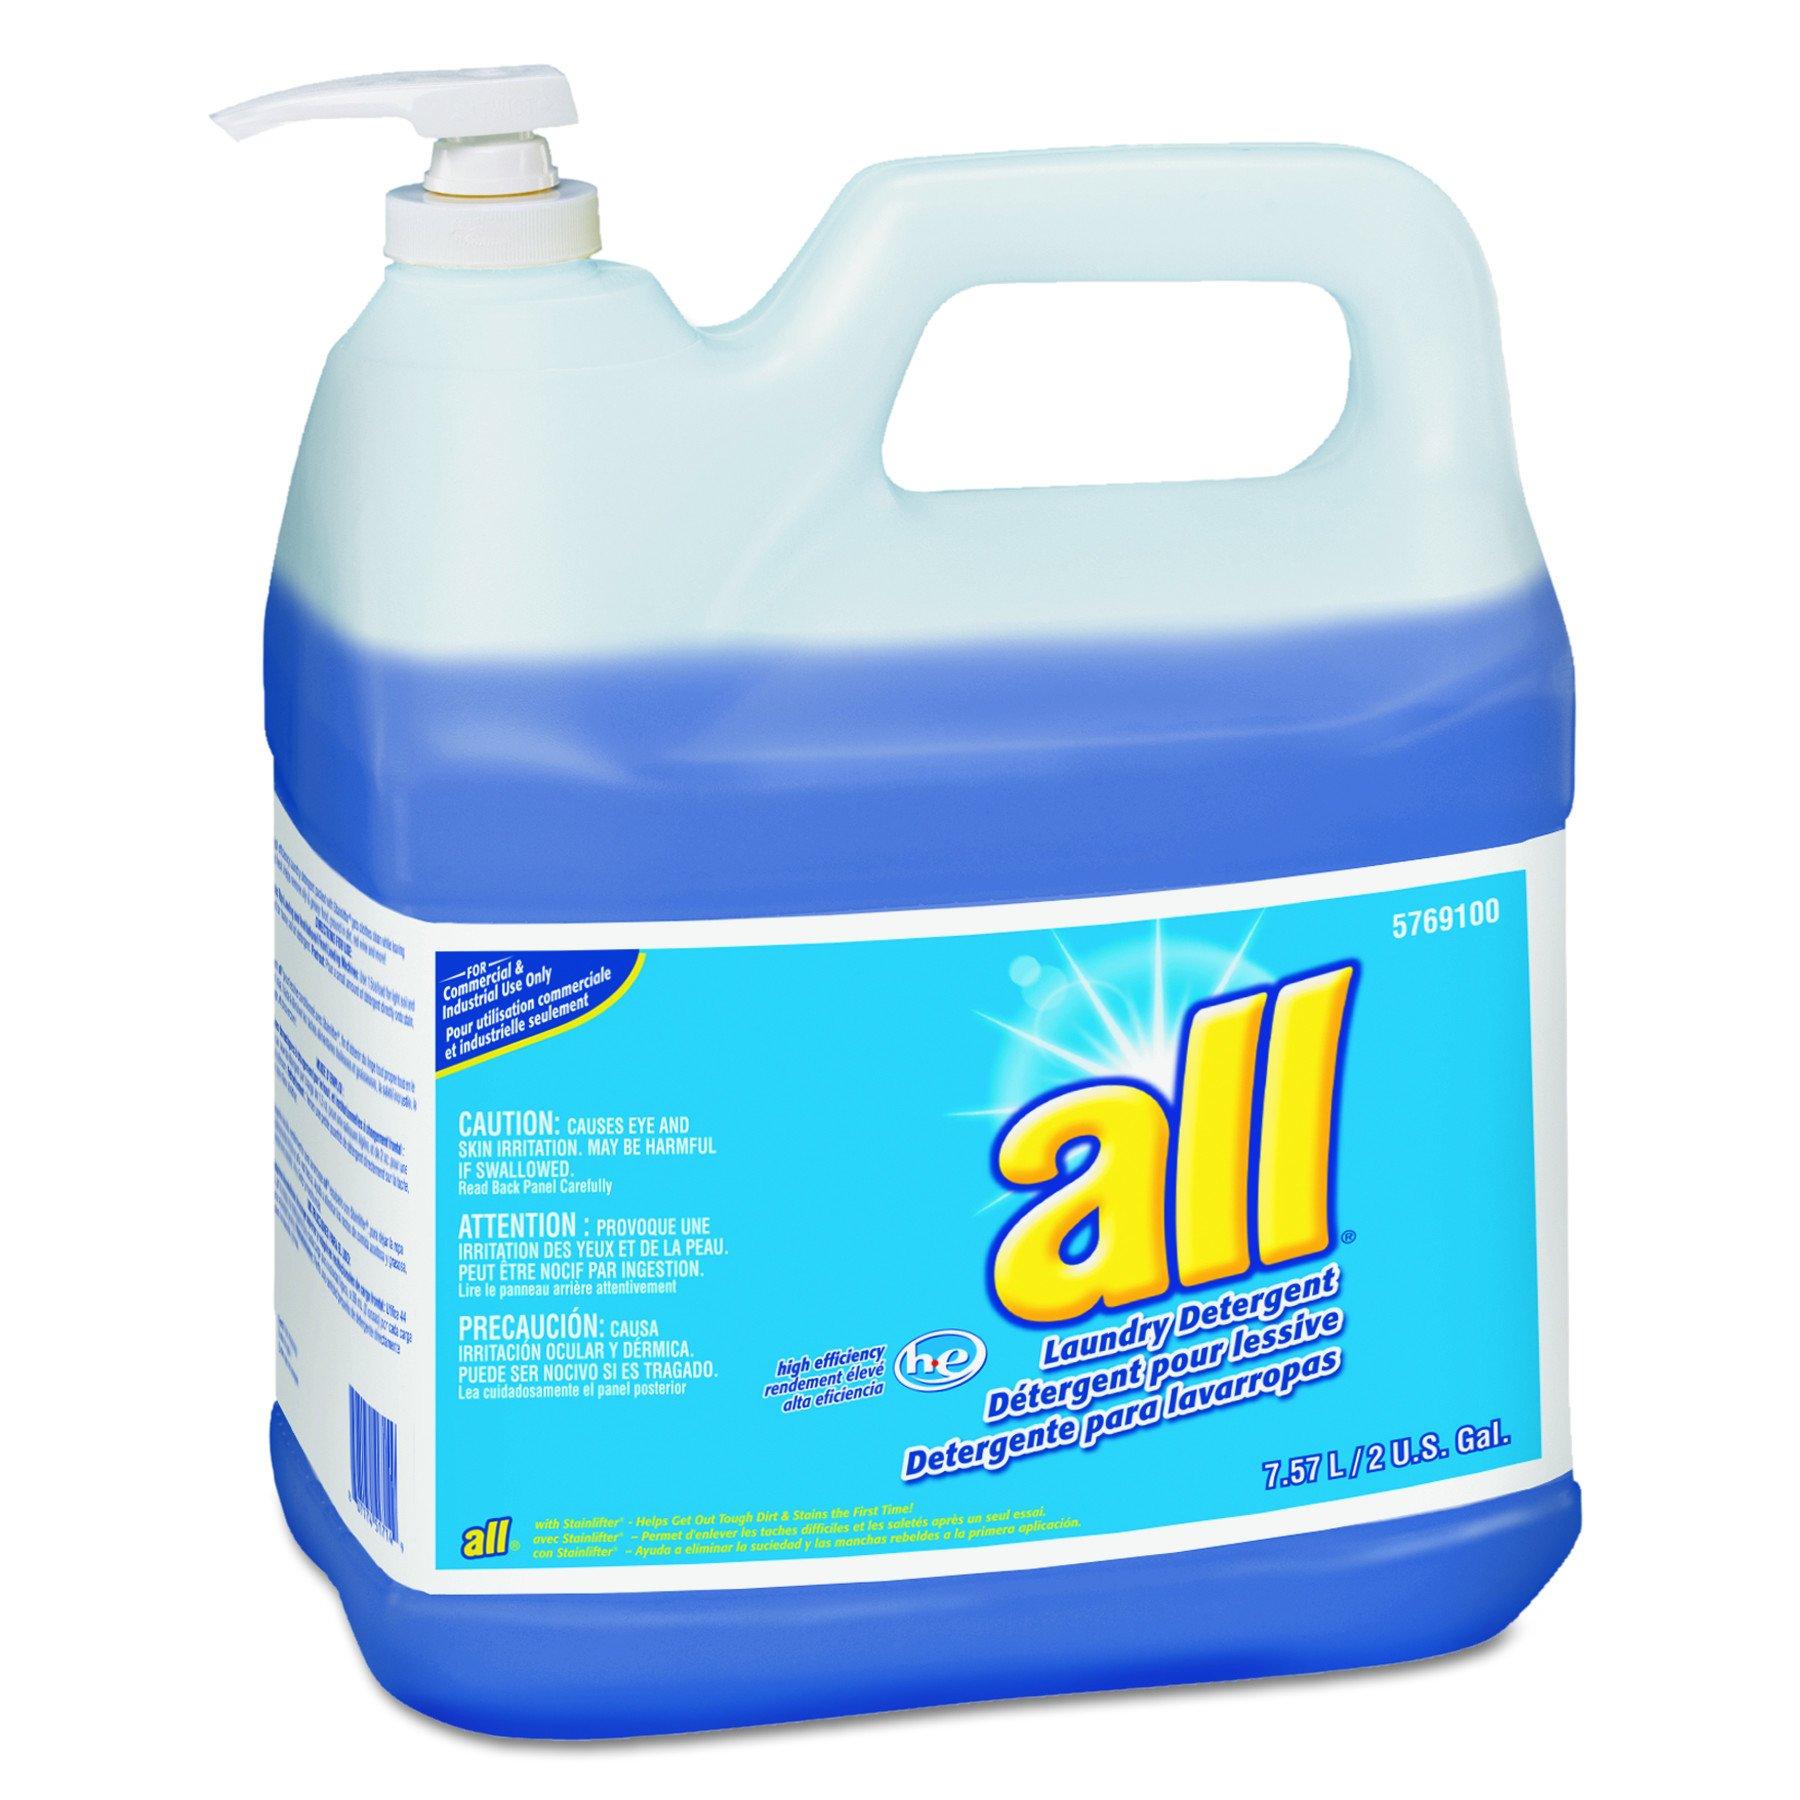 All 95769100 HE Liquid Laundry Detergent, Original Scent, 2gal Pump Bottle (Case of 2)